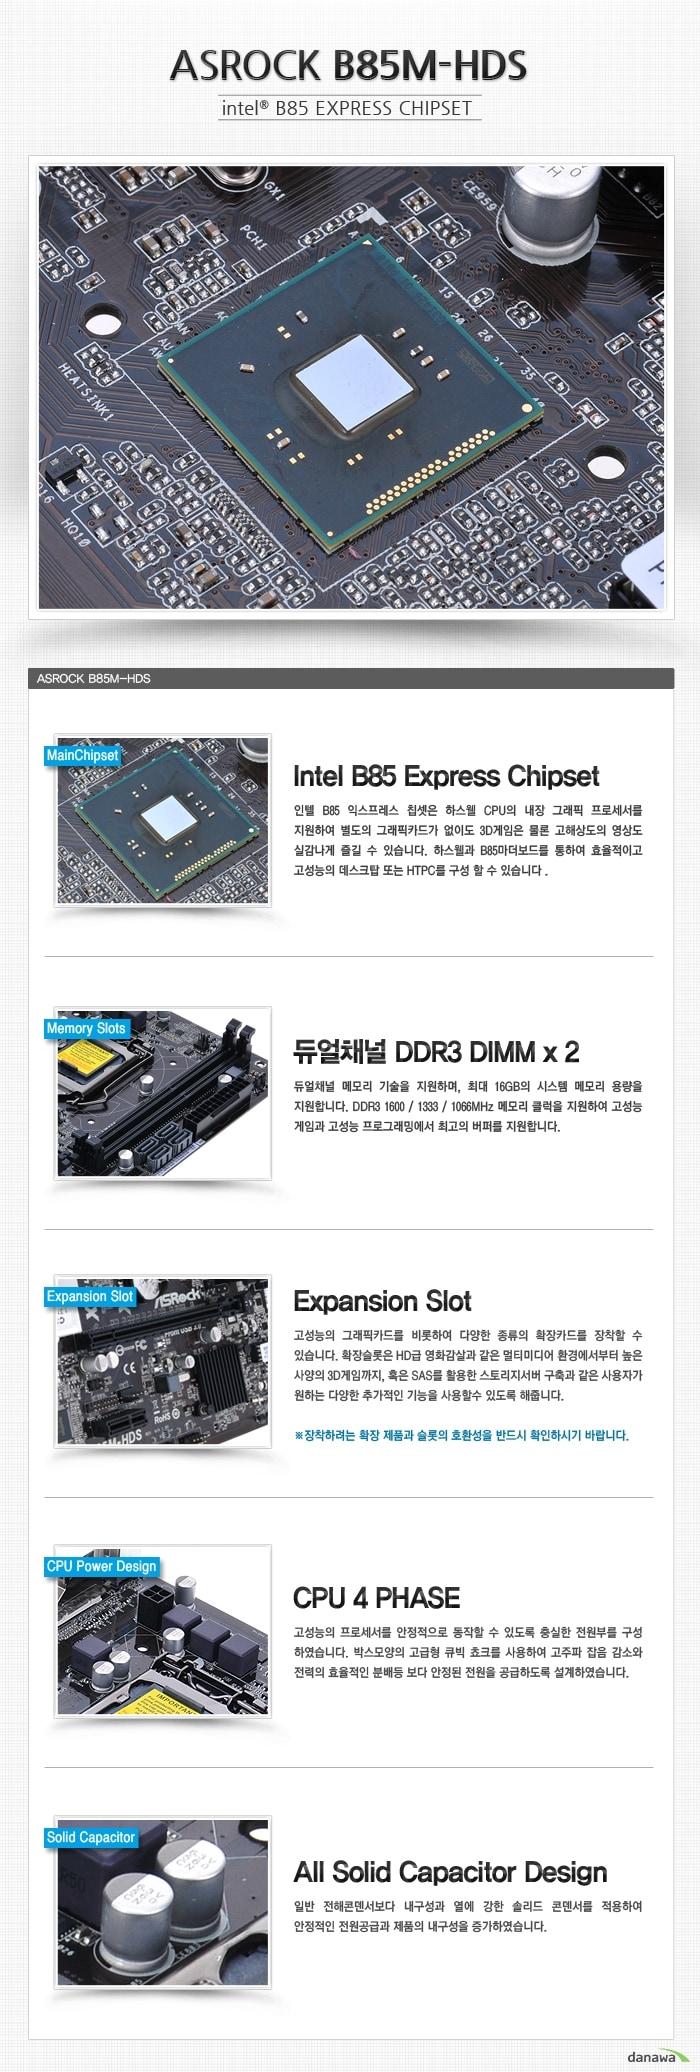 ASRock B85M-HDS 제품의 각 부분 세부 설명 및 이미지